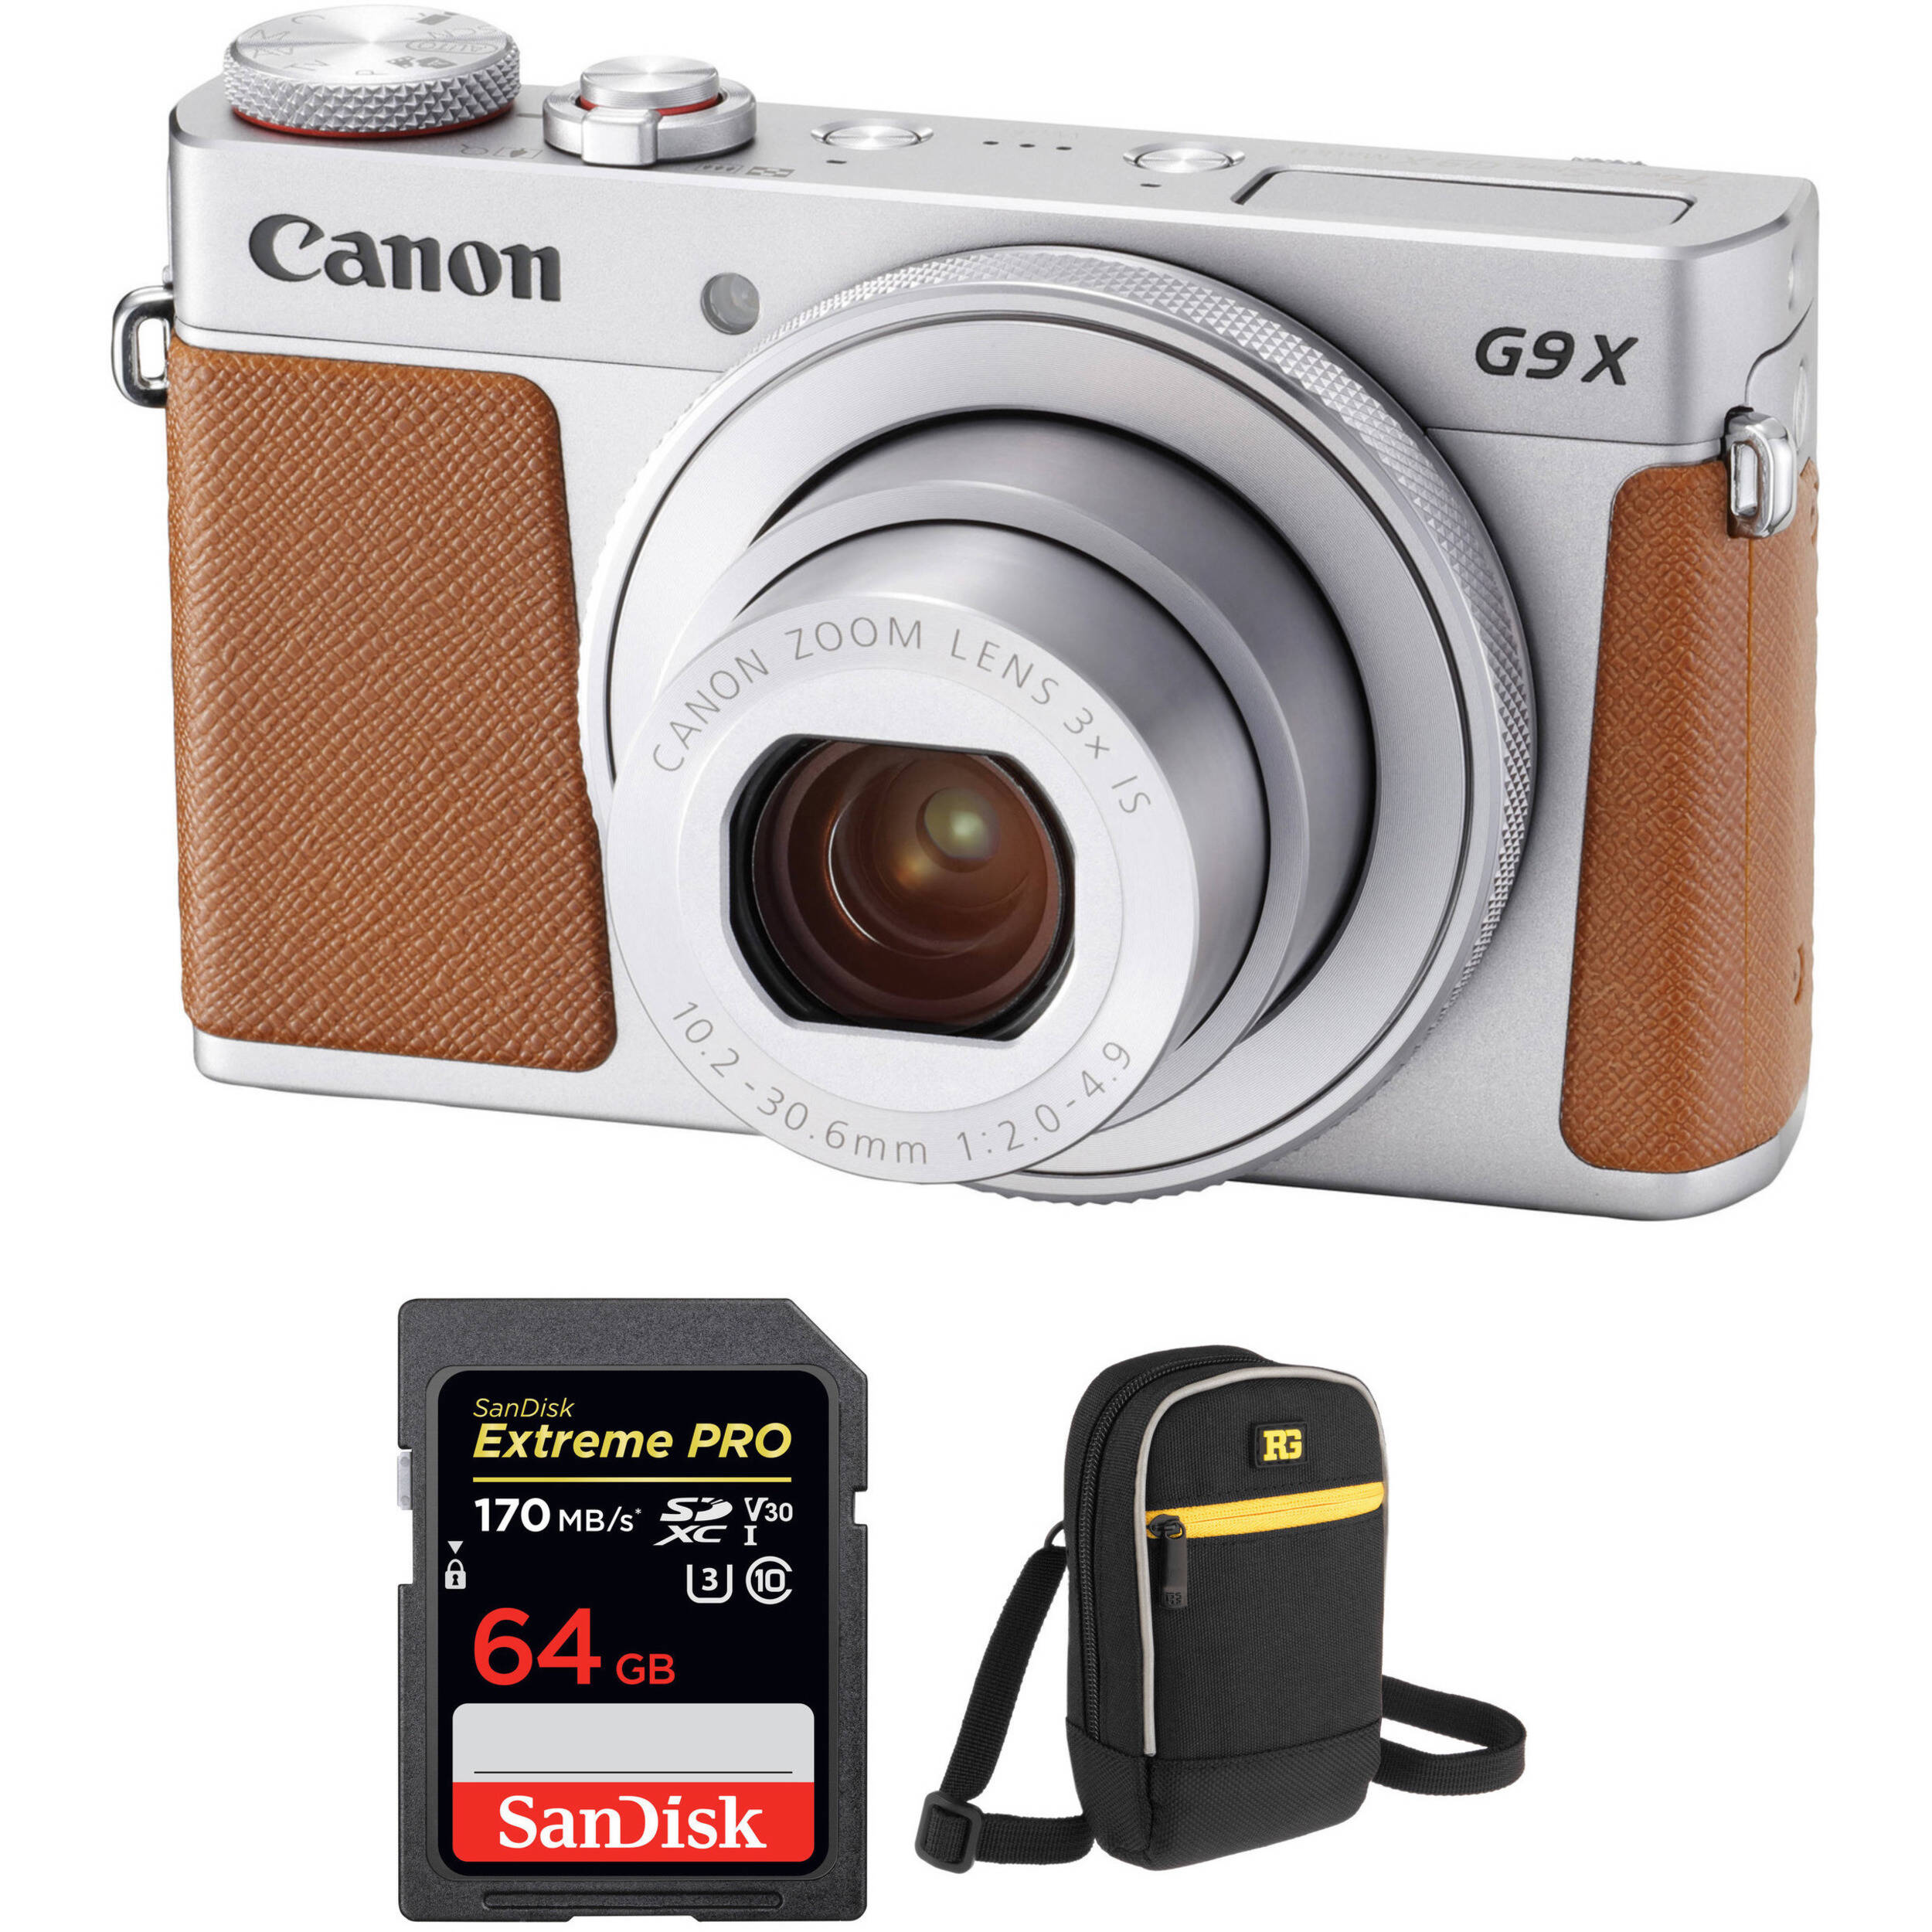 canon powershot g9 x mark ii digital camera with free accessory rh bhphotovideo com Digital Camera Canon PowerShot G9 Canon PowerShot G9 X Mark II